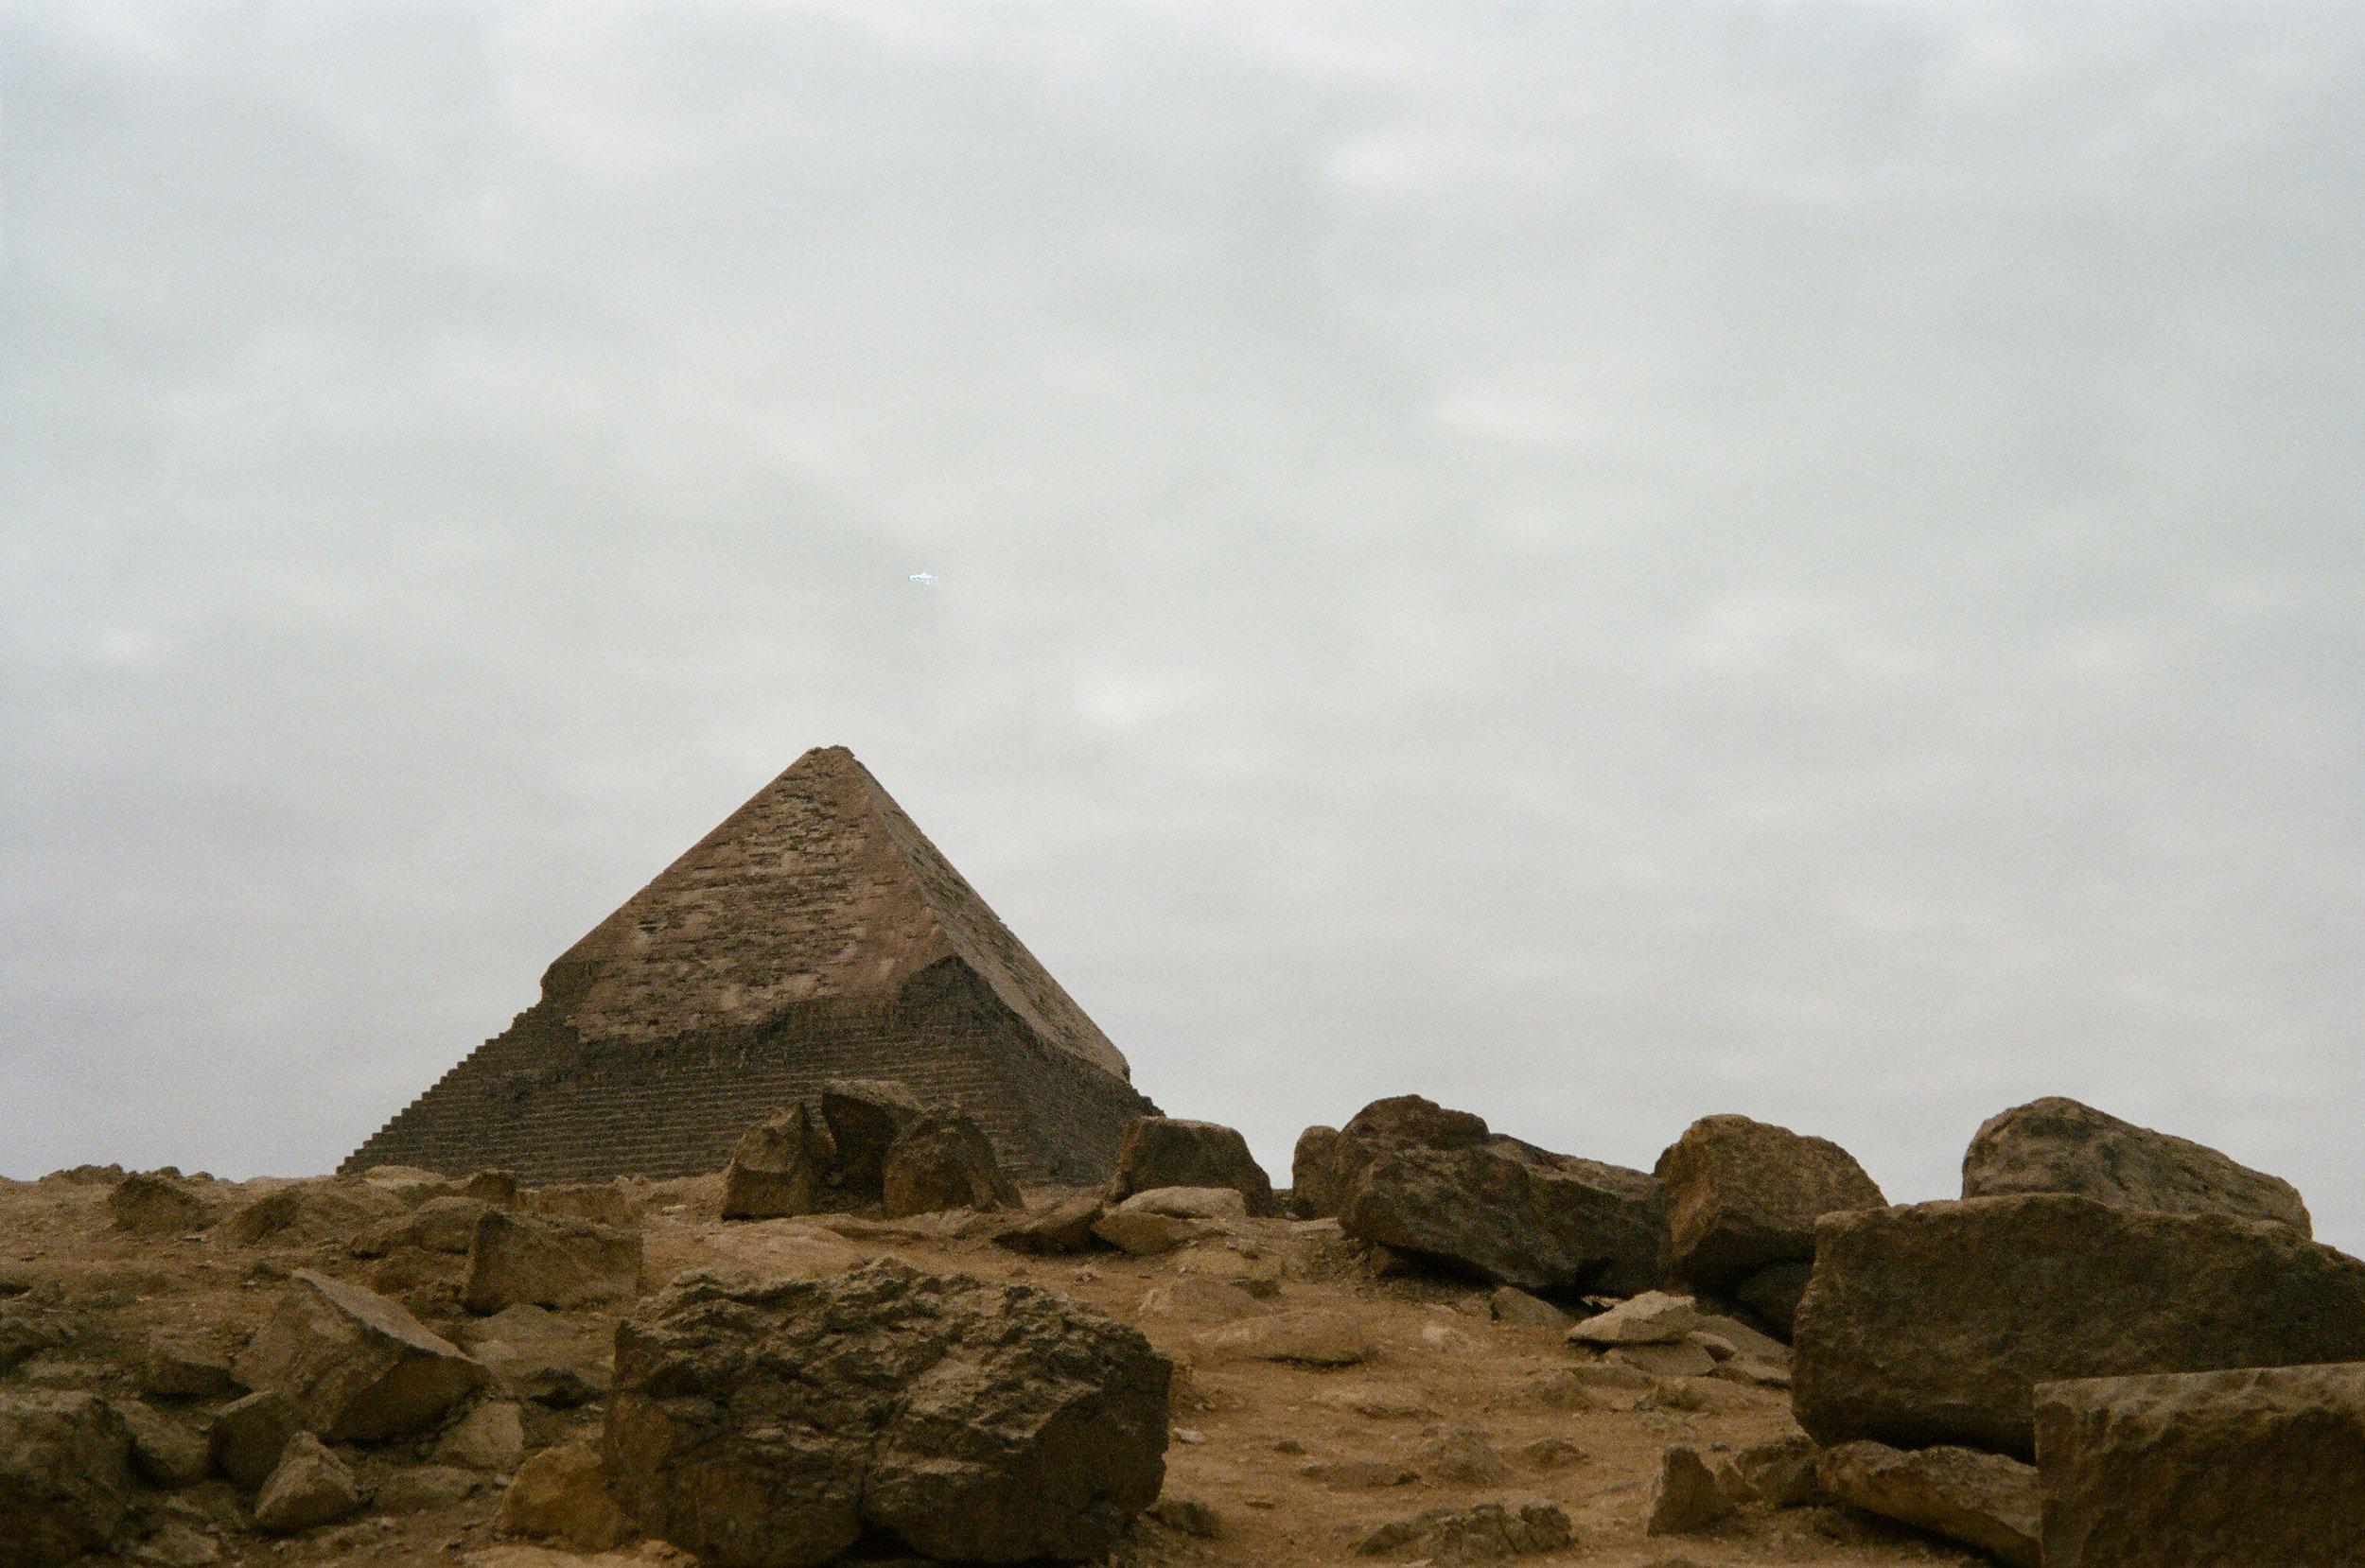 Great Pyramids of Giza, 2018